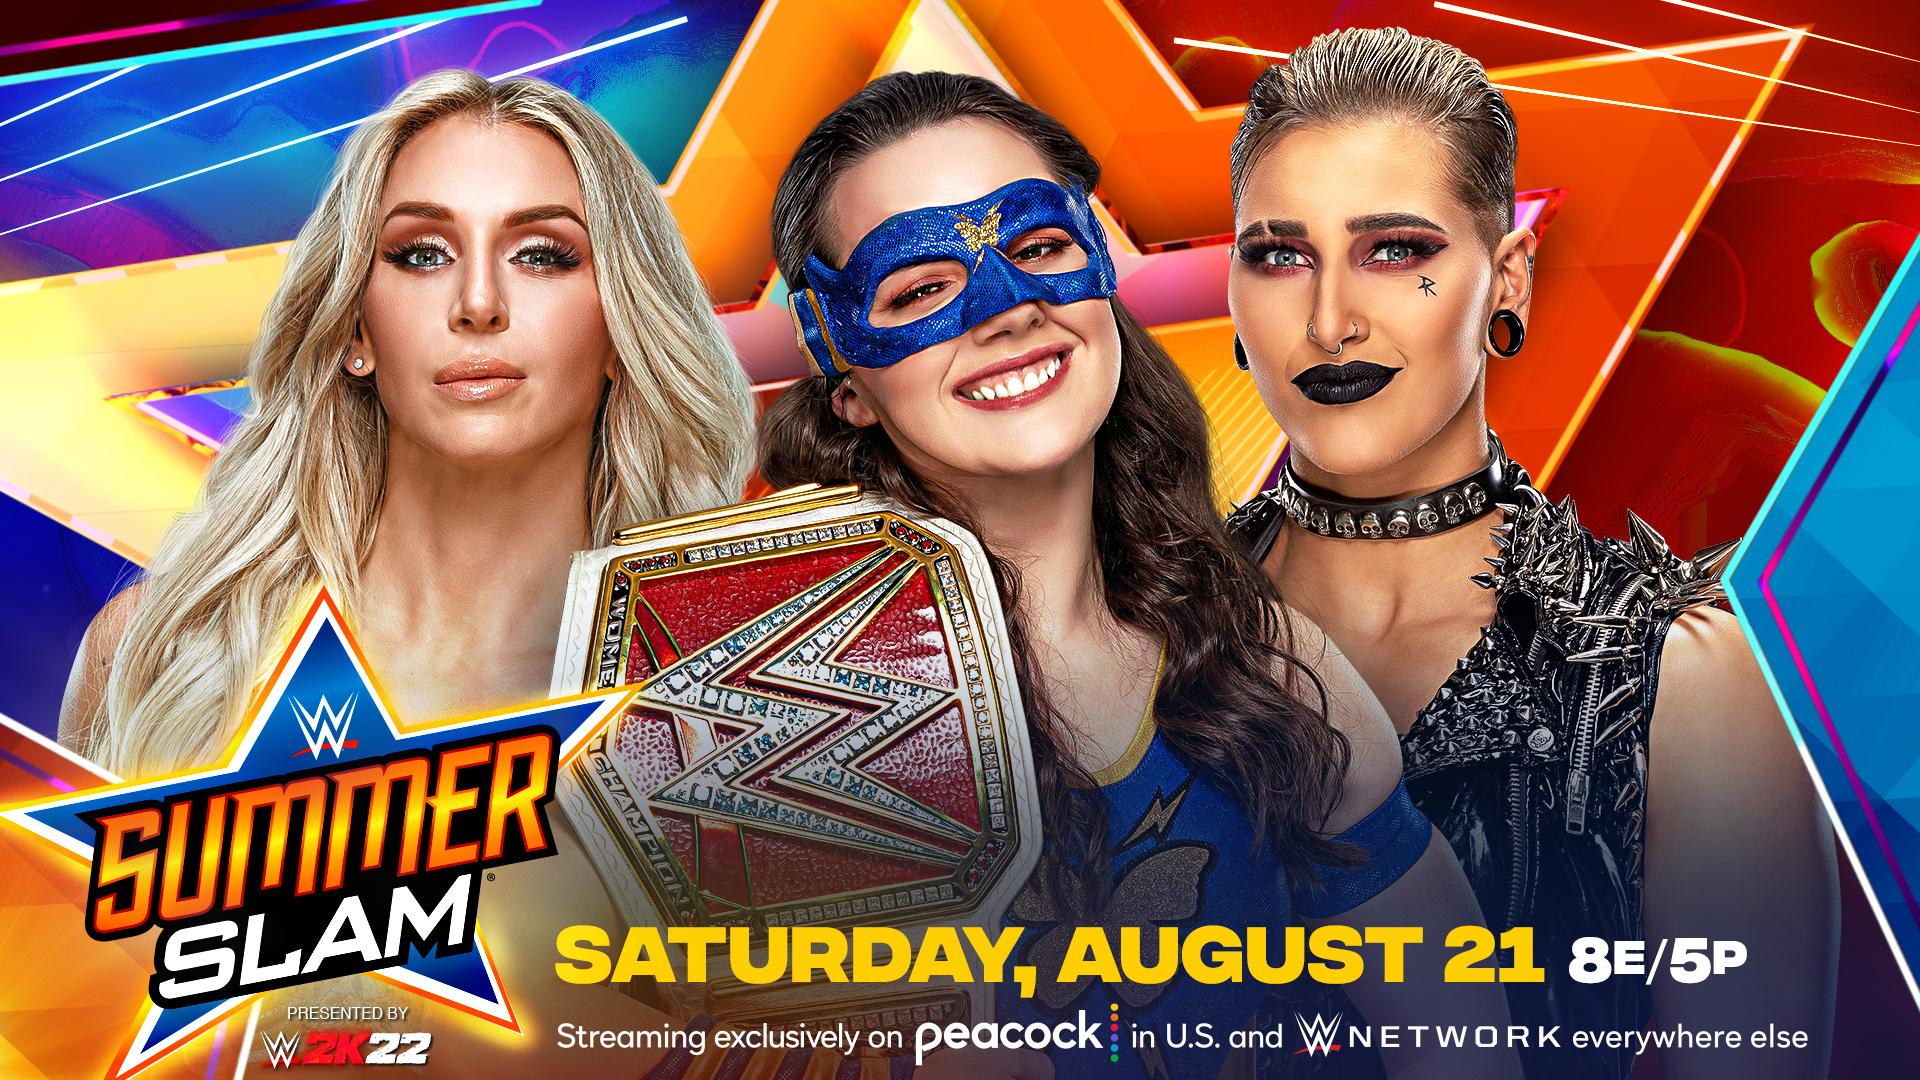 Grande combate por título é anunciado para o WWE SummerSlam